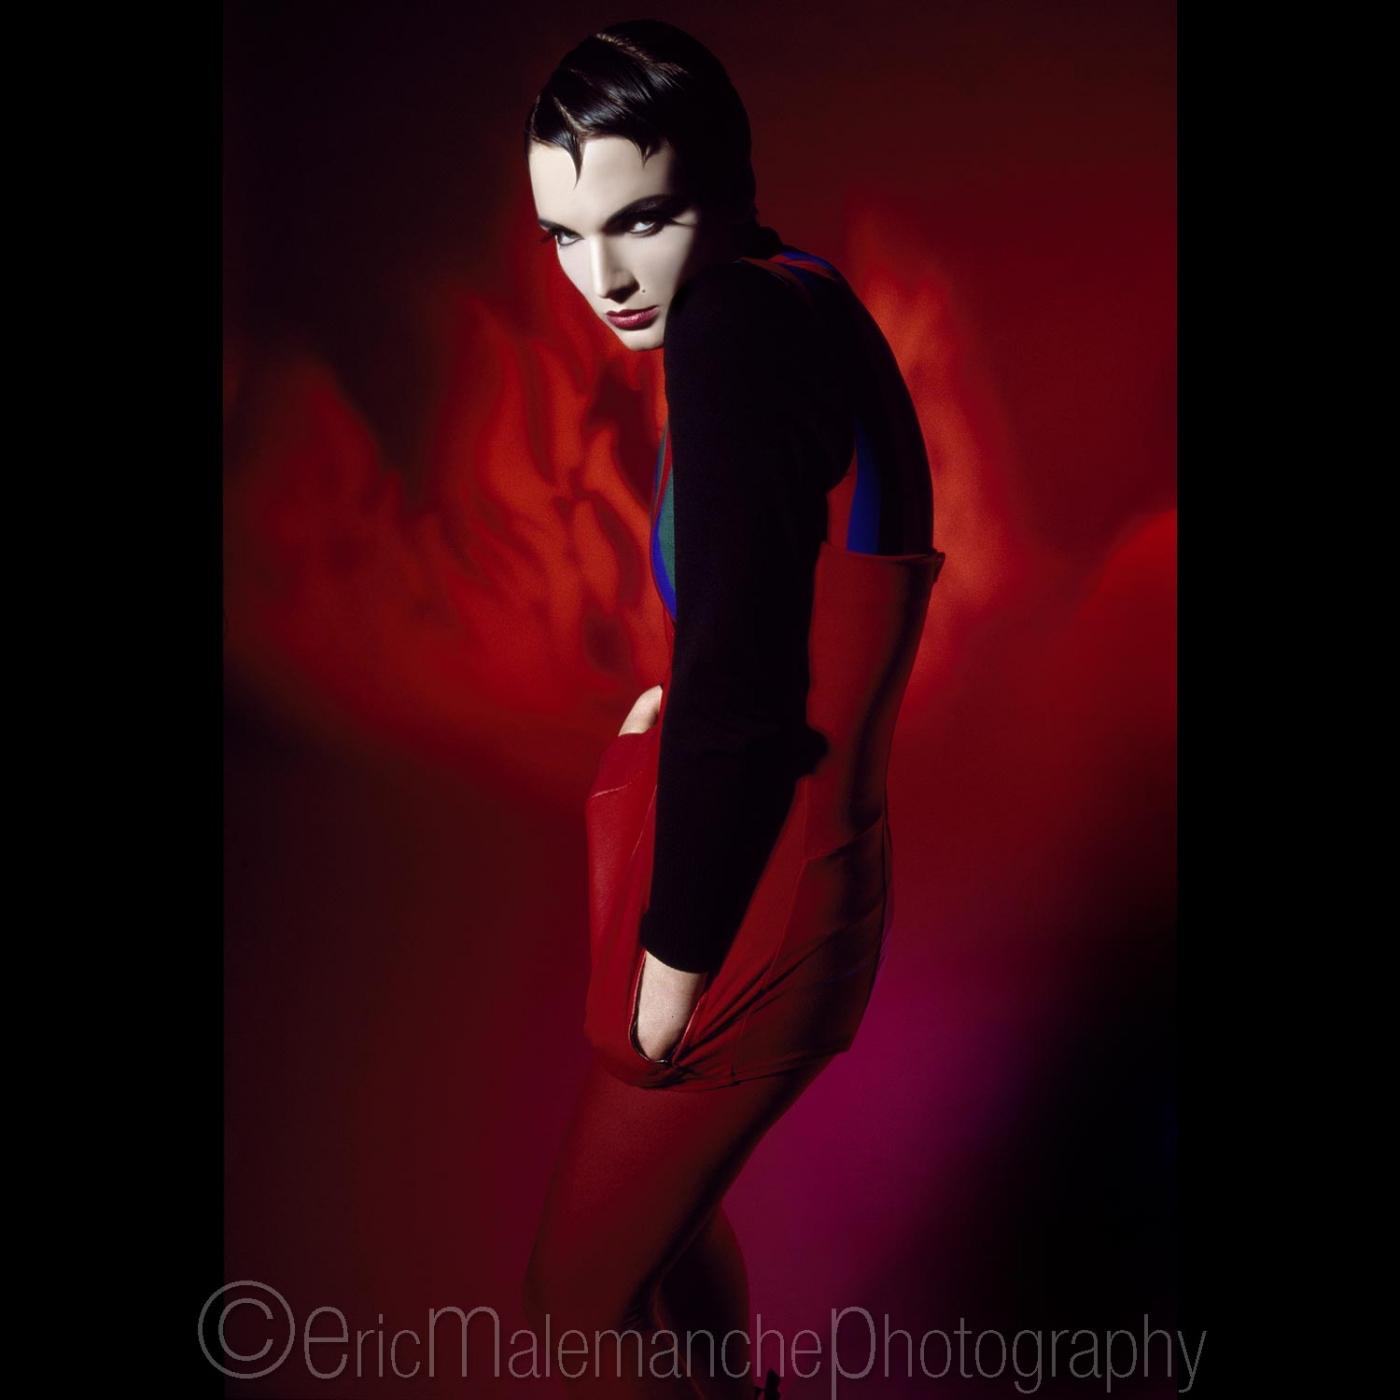 https://www.ericmalemanche.com/imagess/topics/fashion-90-s/liste/21.jpg